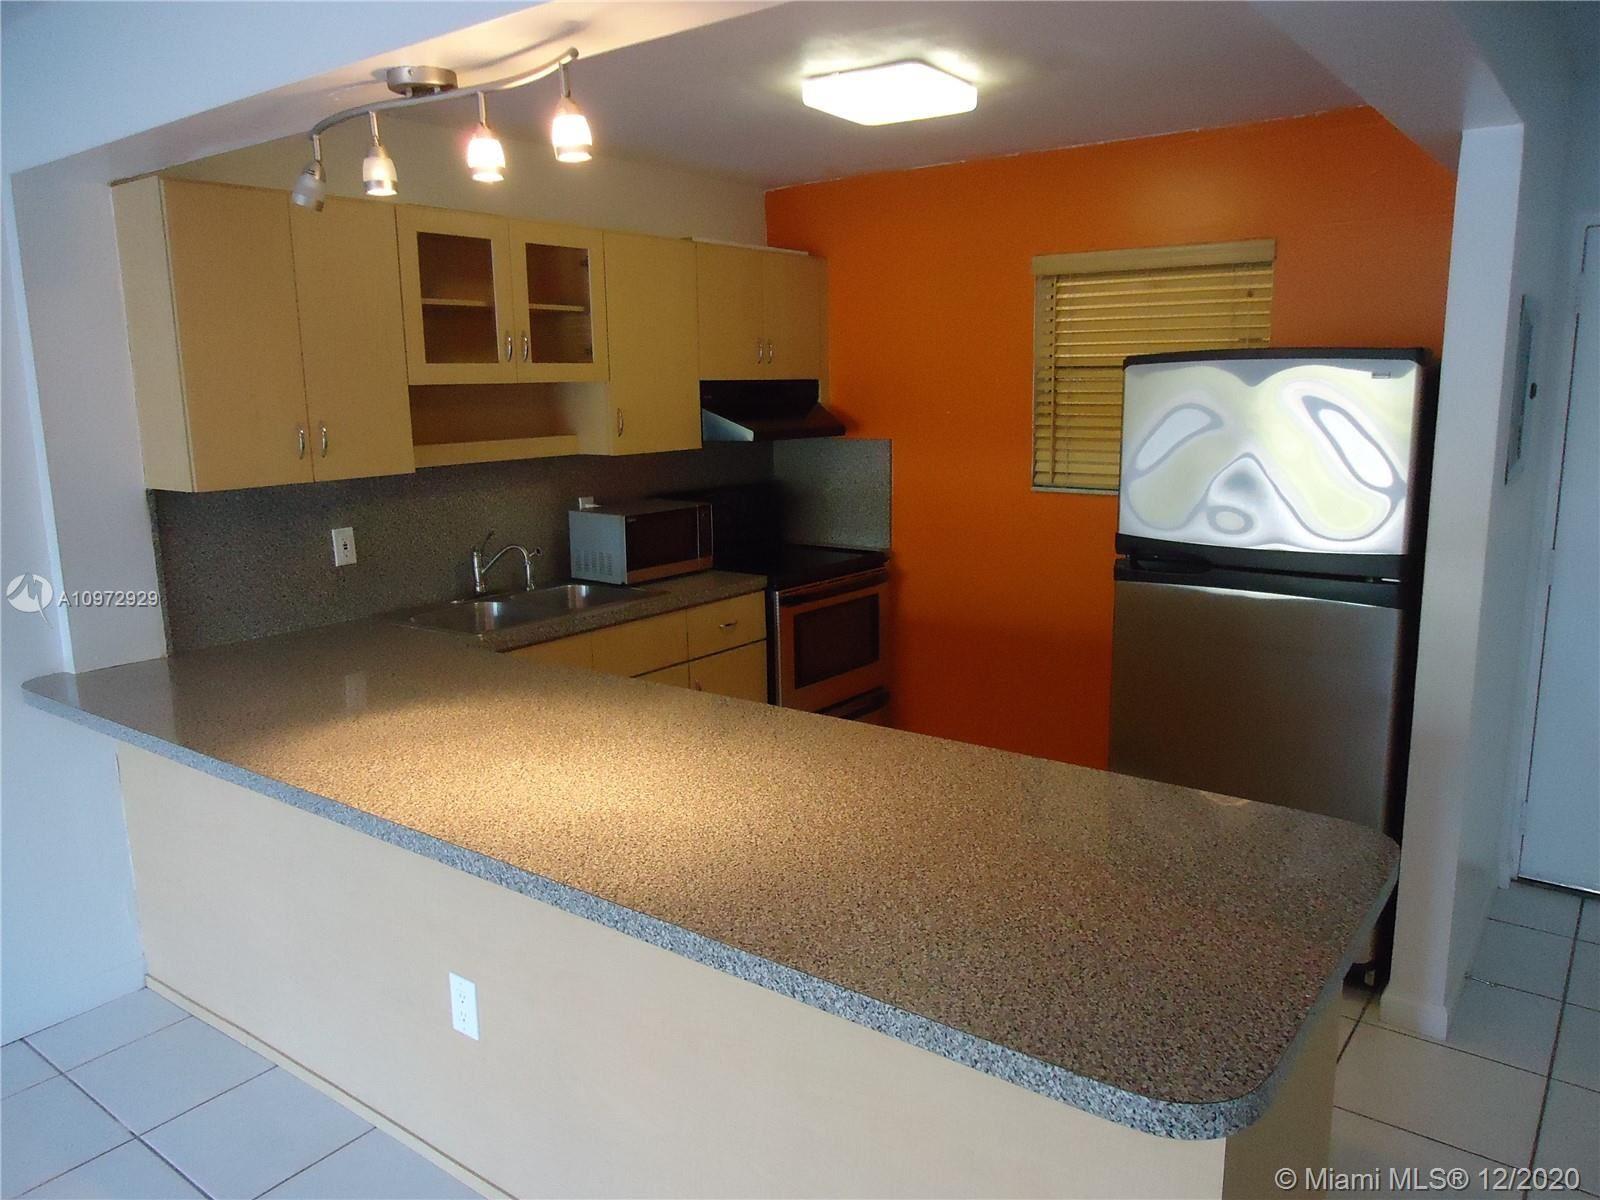 7815 Camino Real #I-101, Miami, FL 33143 - #: A10972929